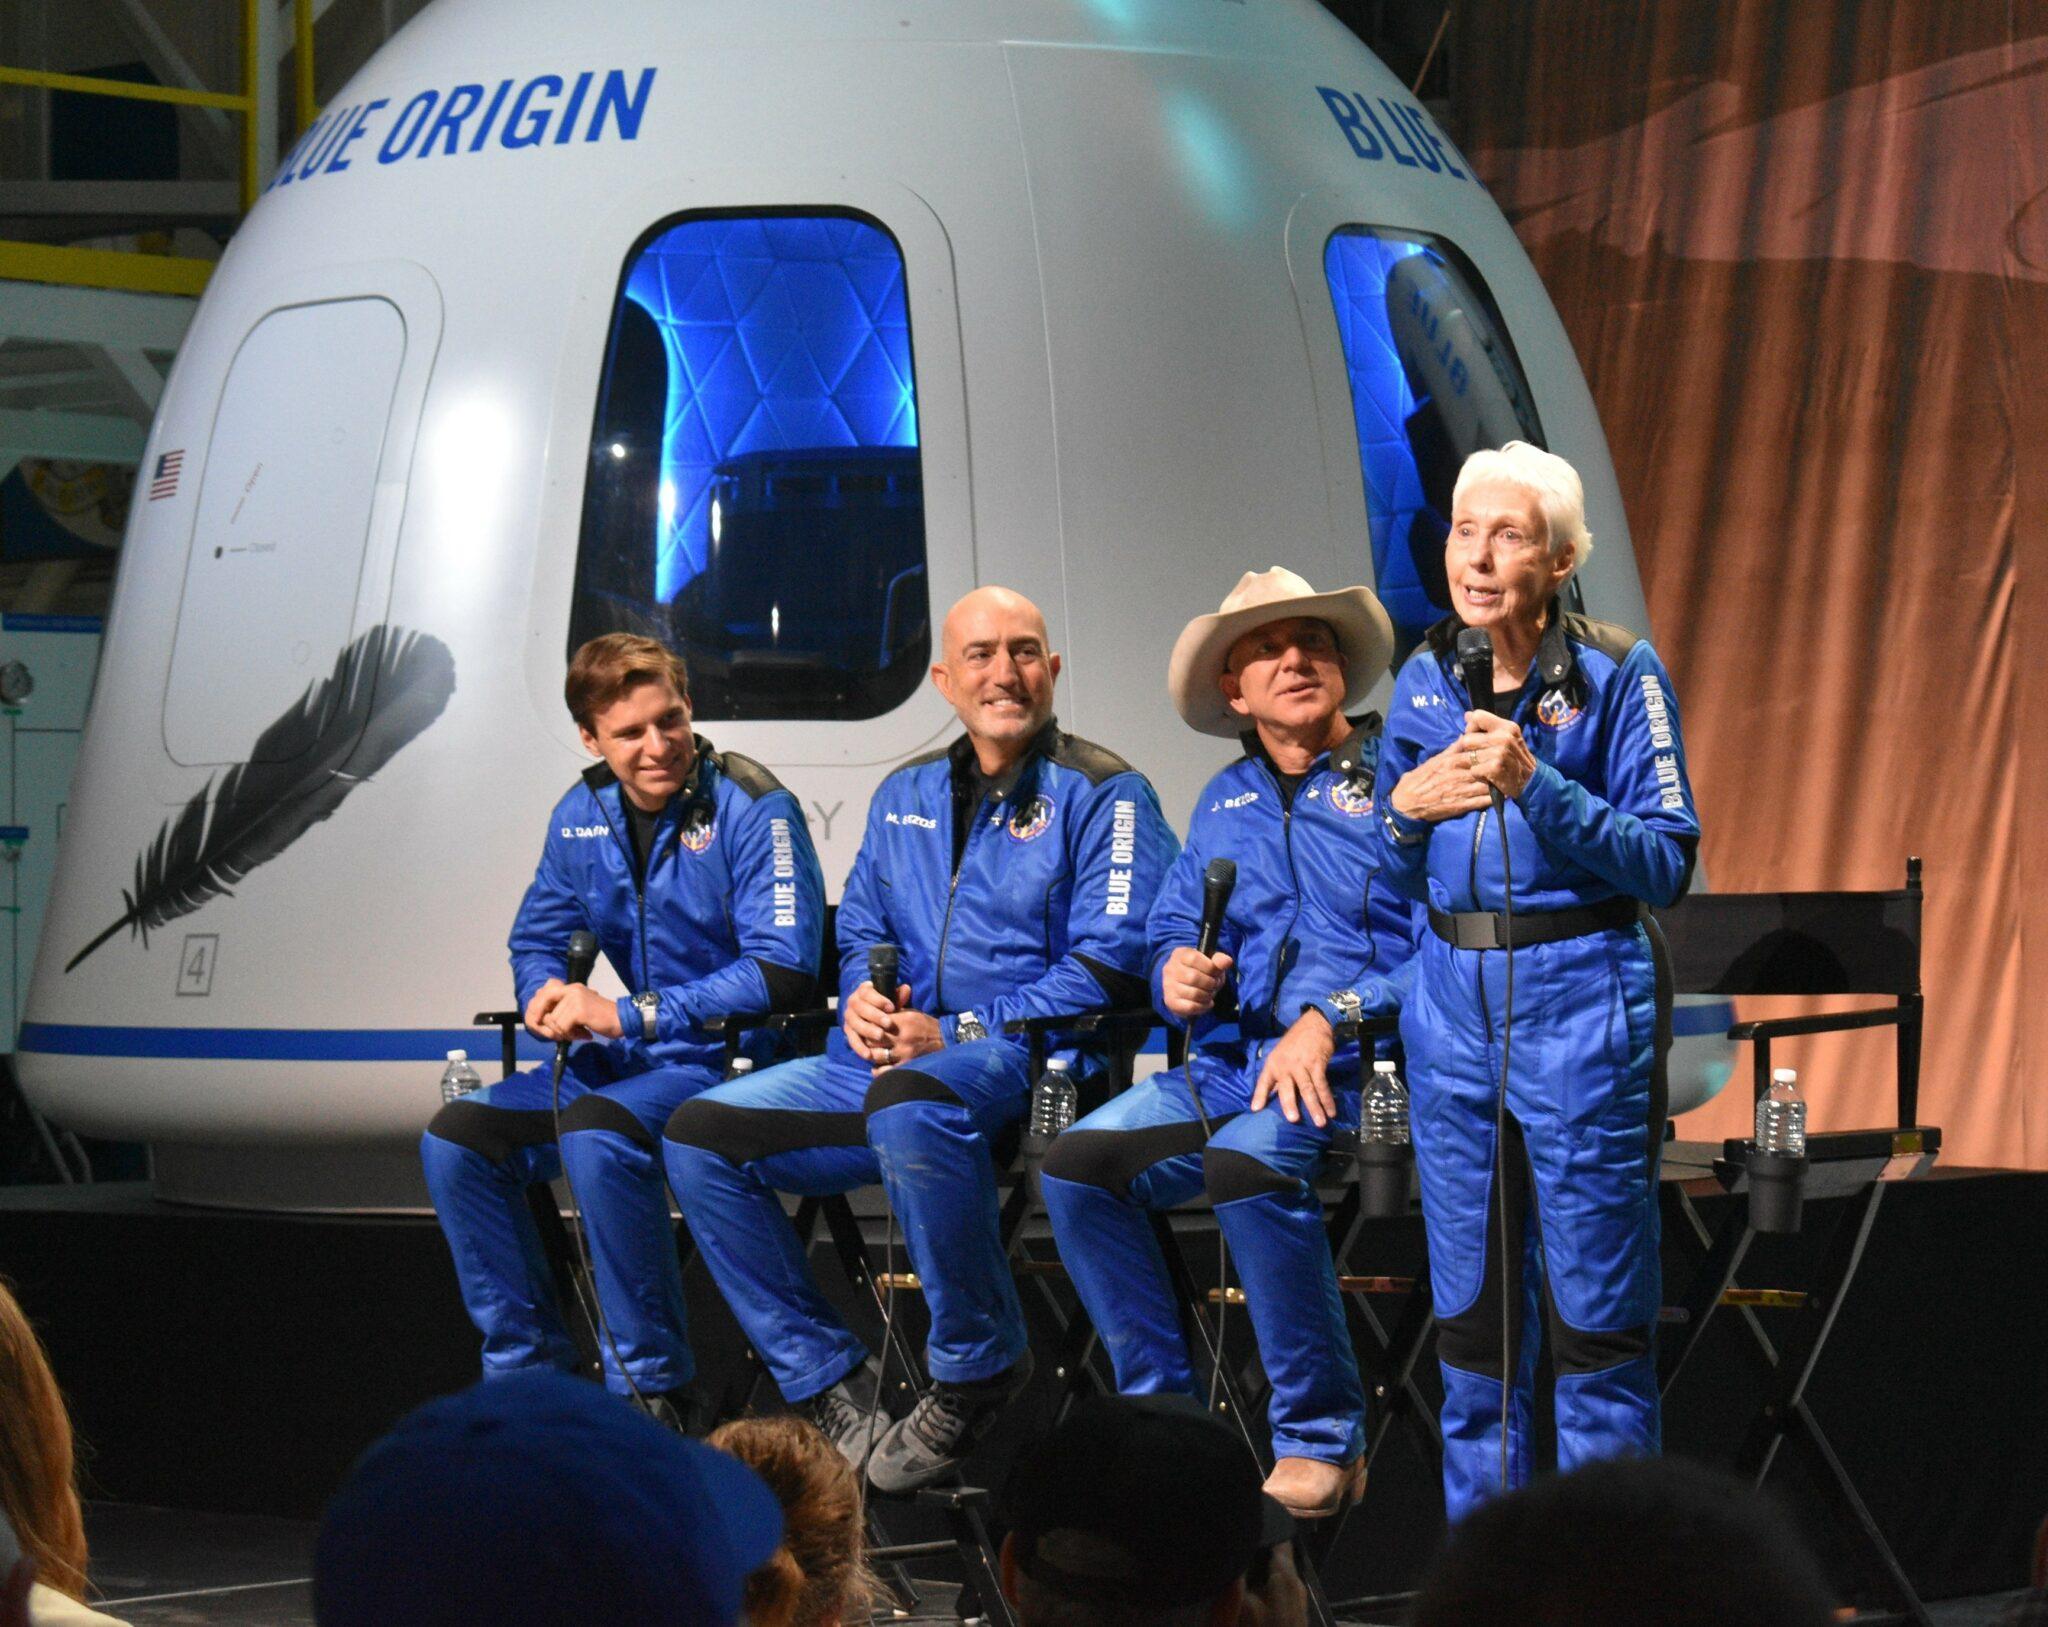 Blue Origin's suborbital space ticket sales are nearing $100M, Jeff Bezos says